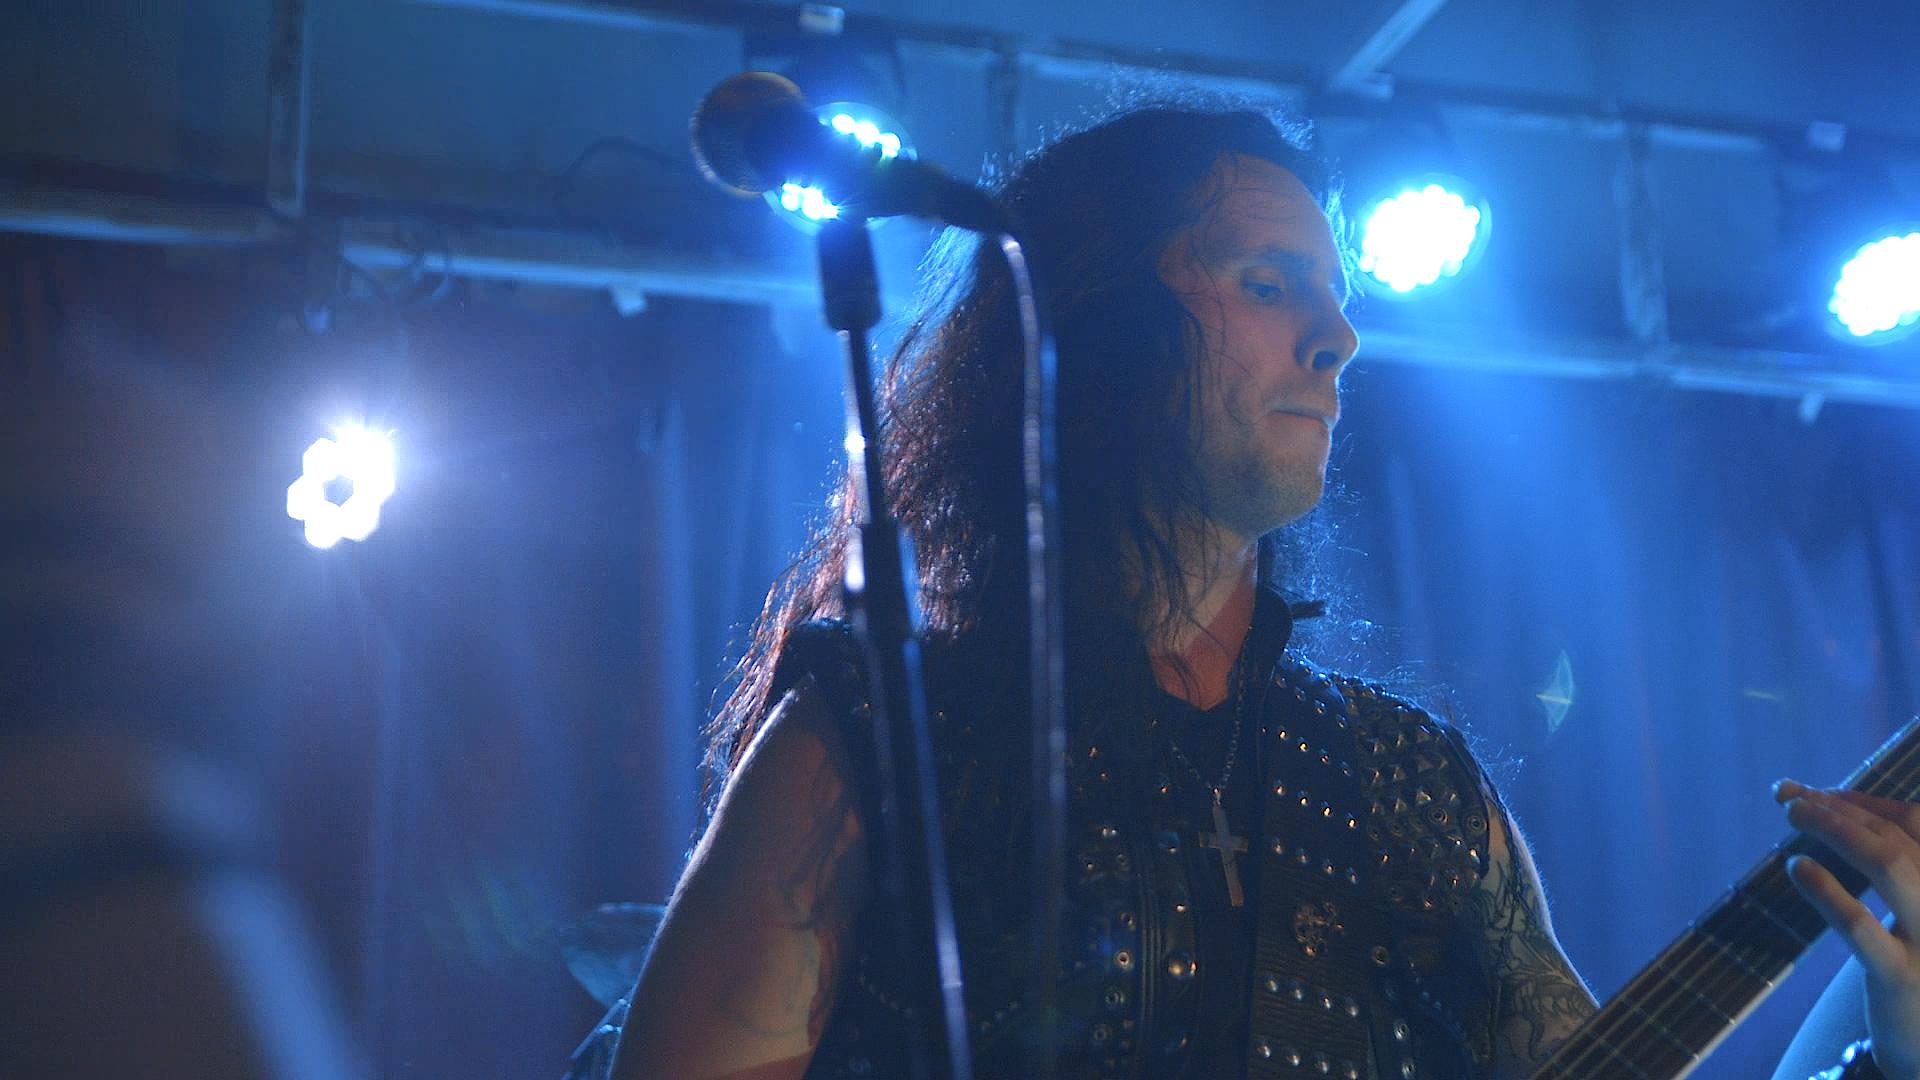 Gus G Firewind: Ο Έλληνας Κιθαρίστας του Ozzy Osbourne και η Μπάντα του